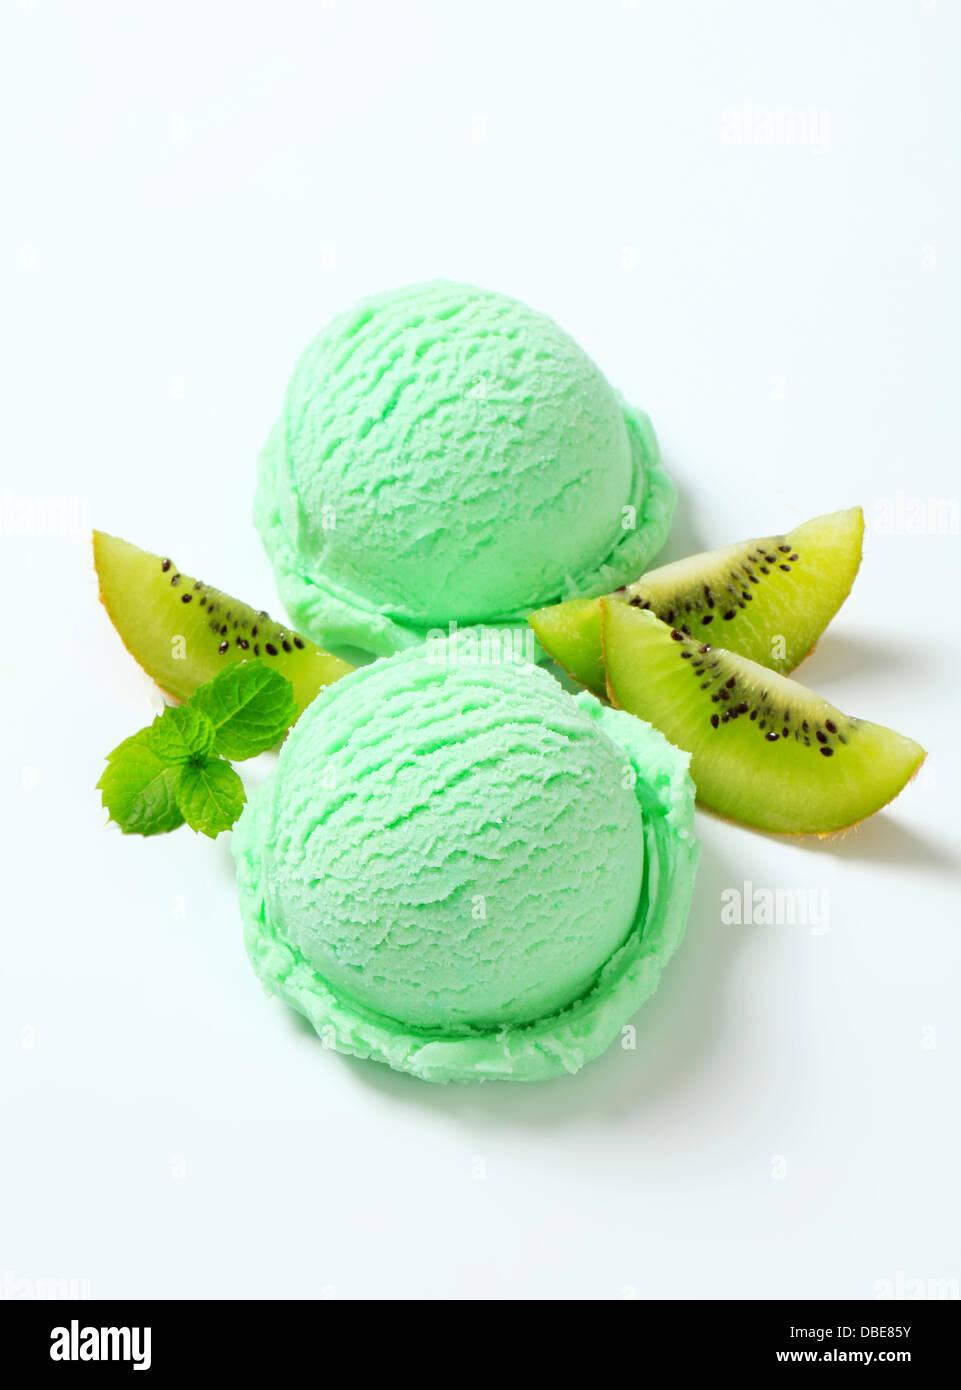 Scoops of light green ice cream and fresh kiwi - Stock Image